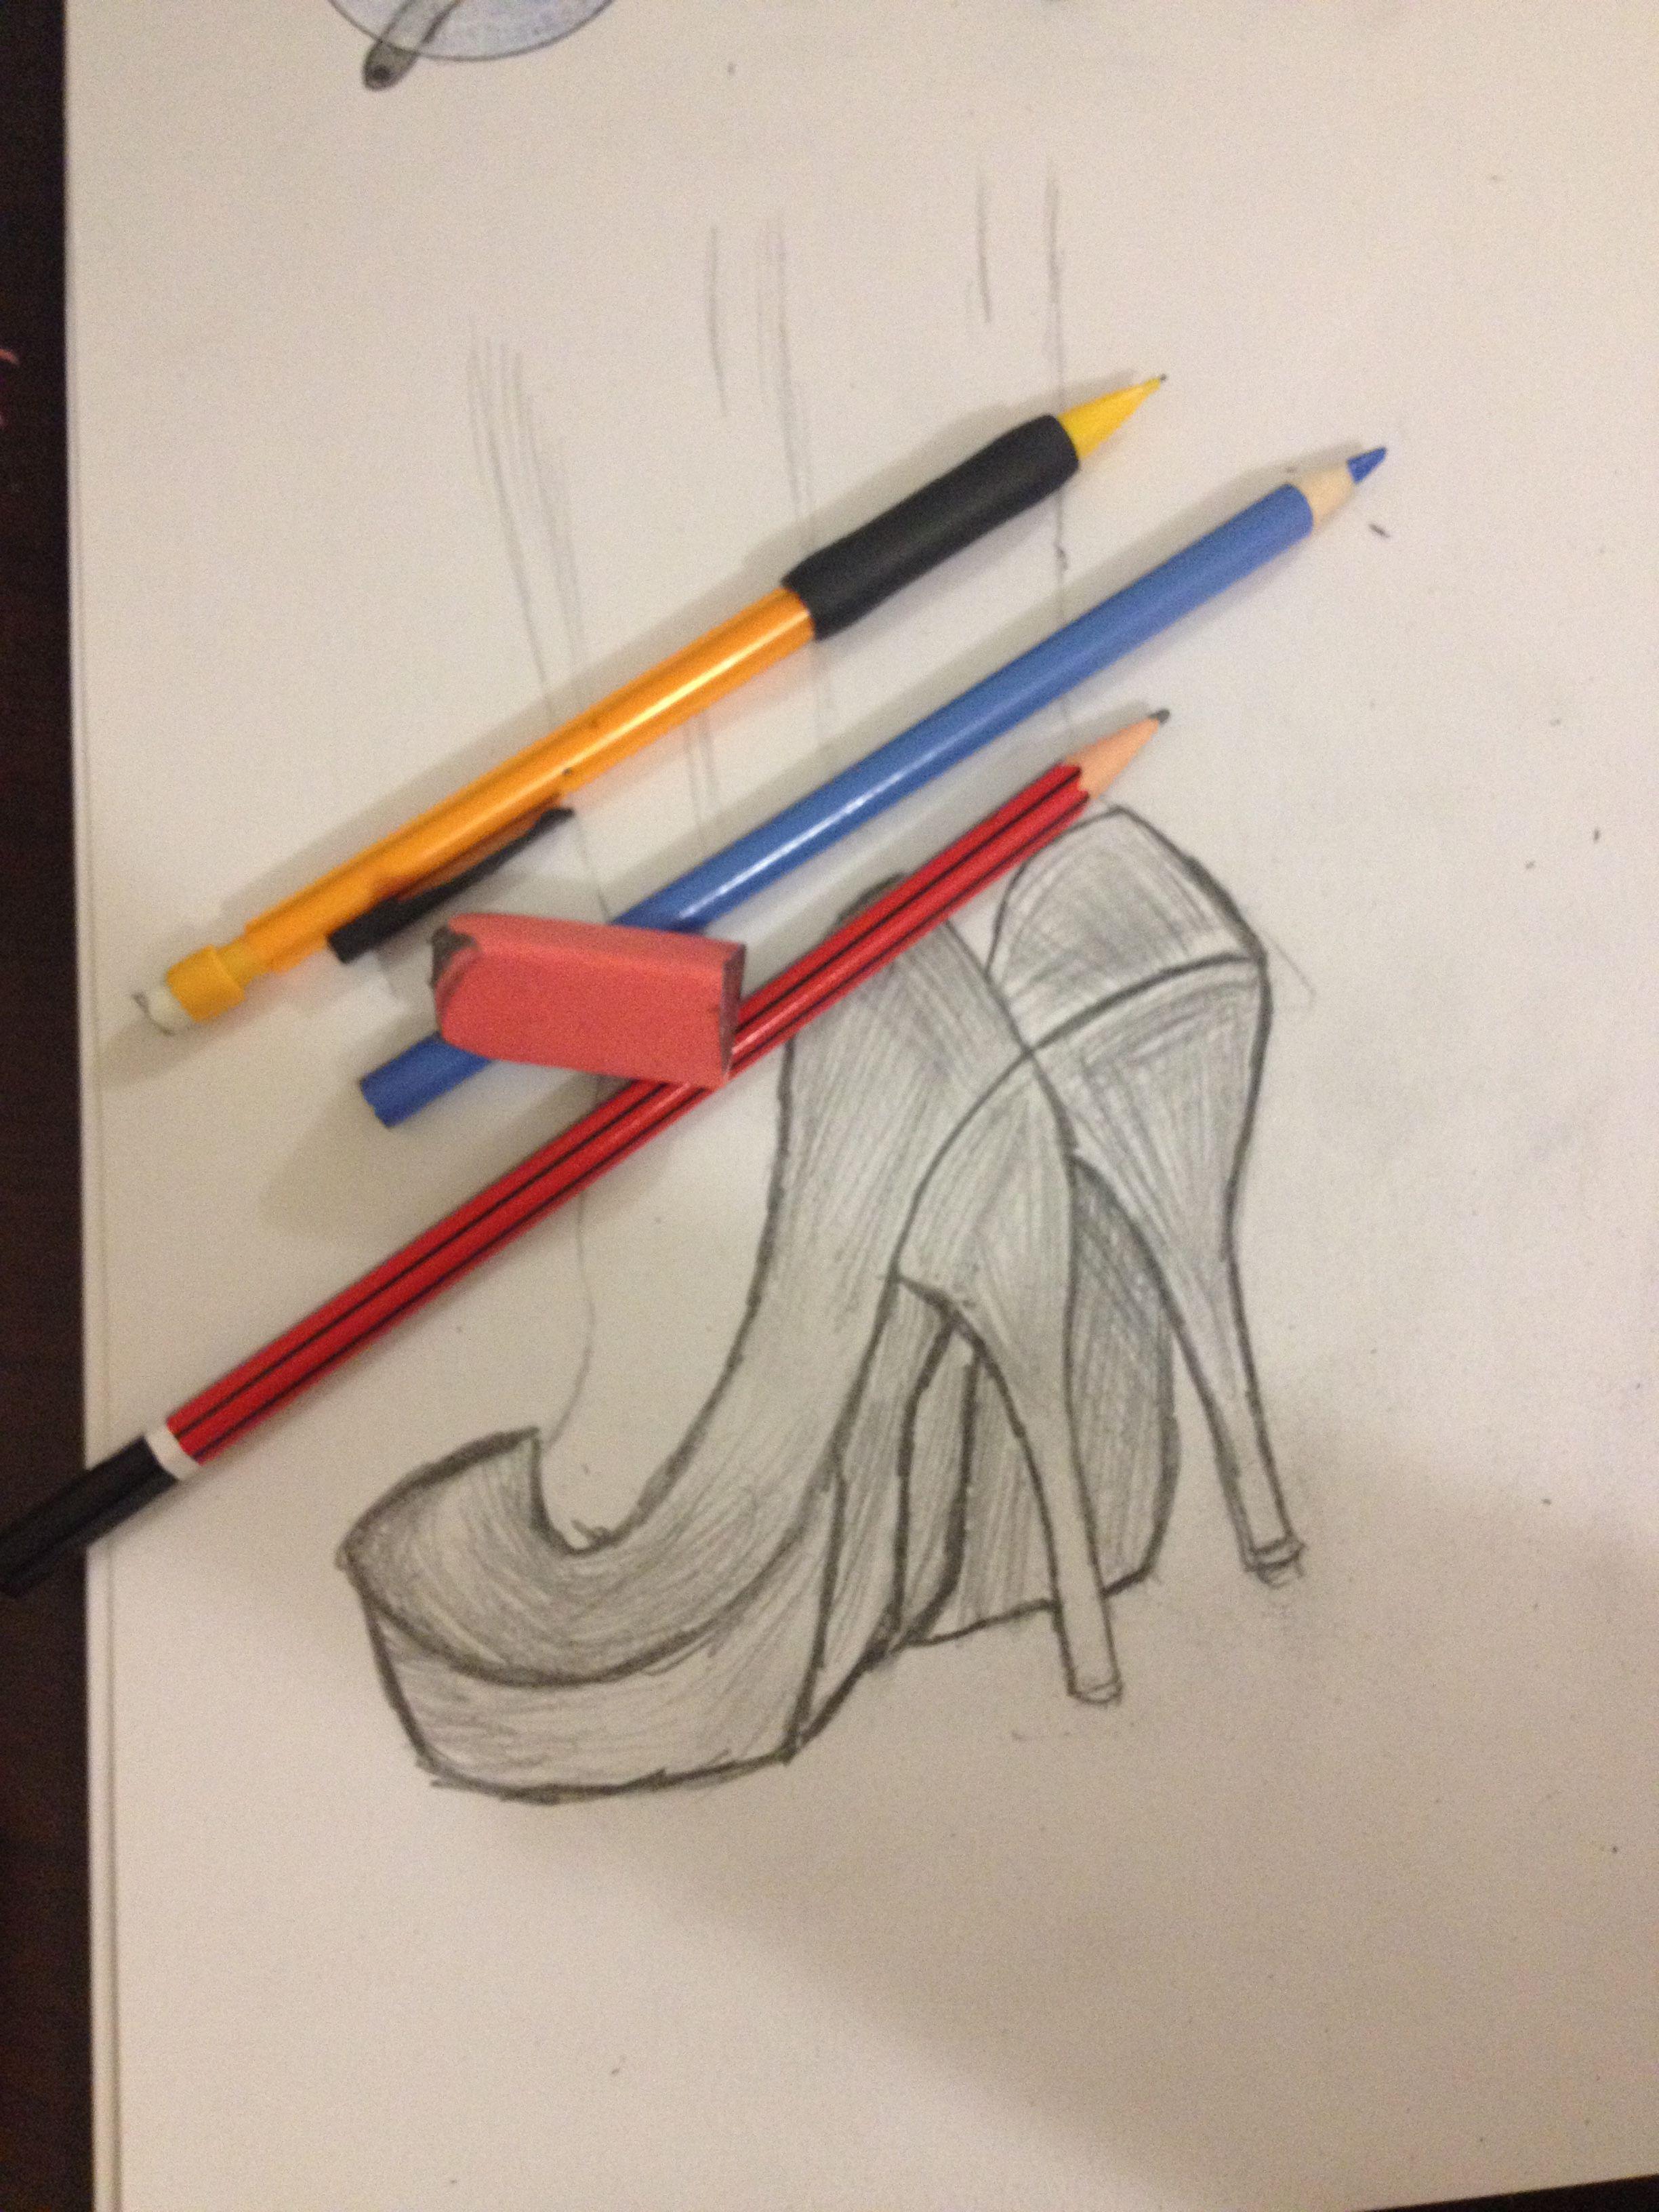 Running through the 6ix with my heels